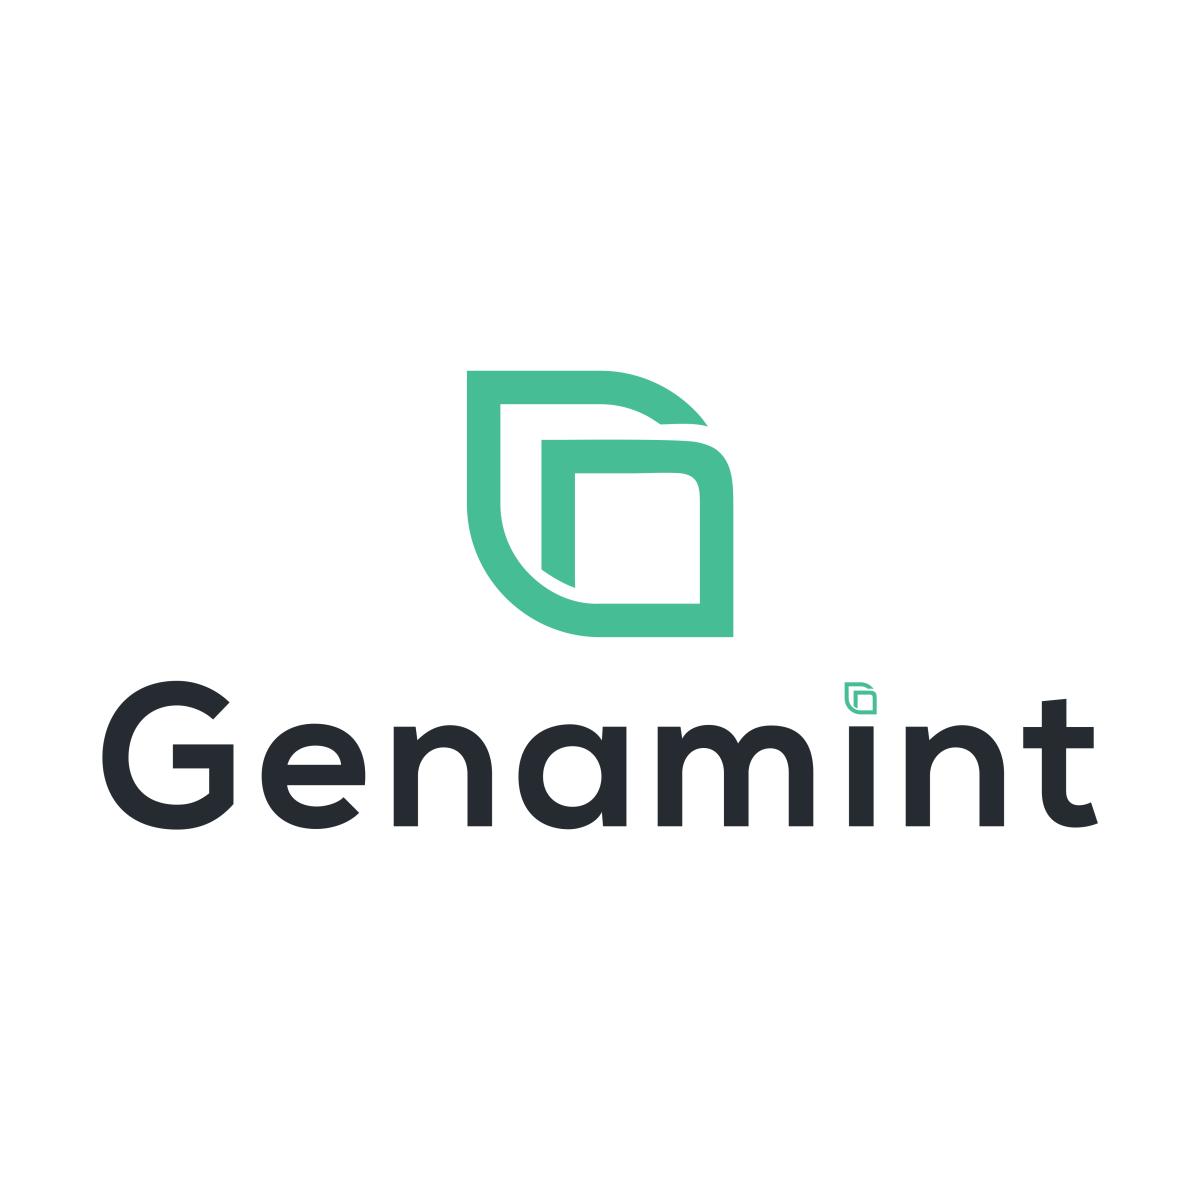 Genamint logo